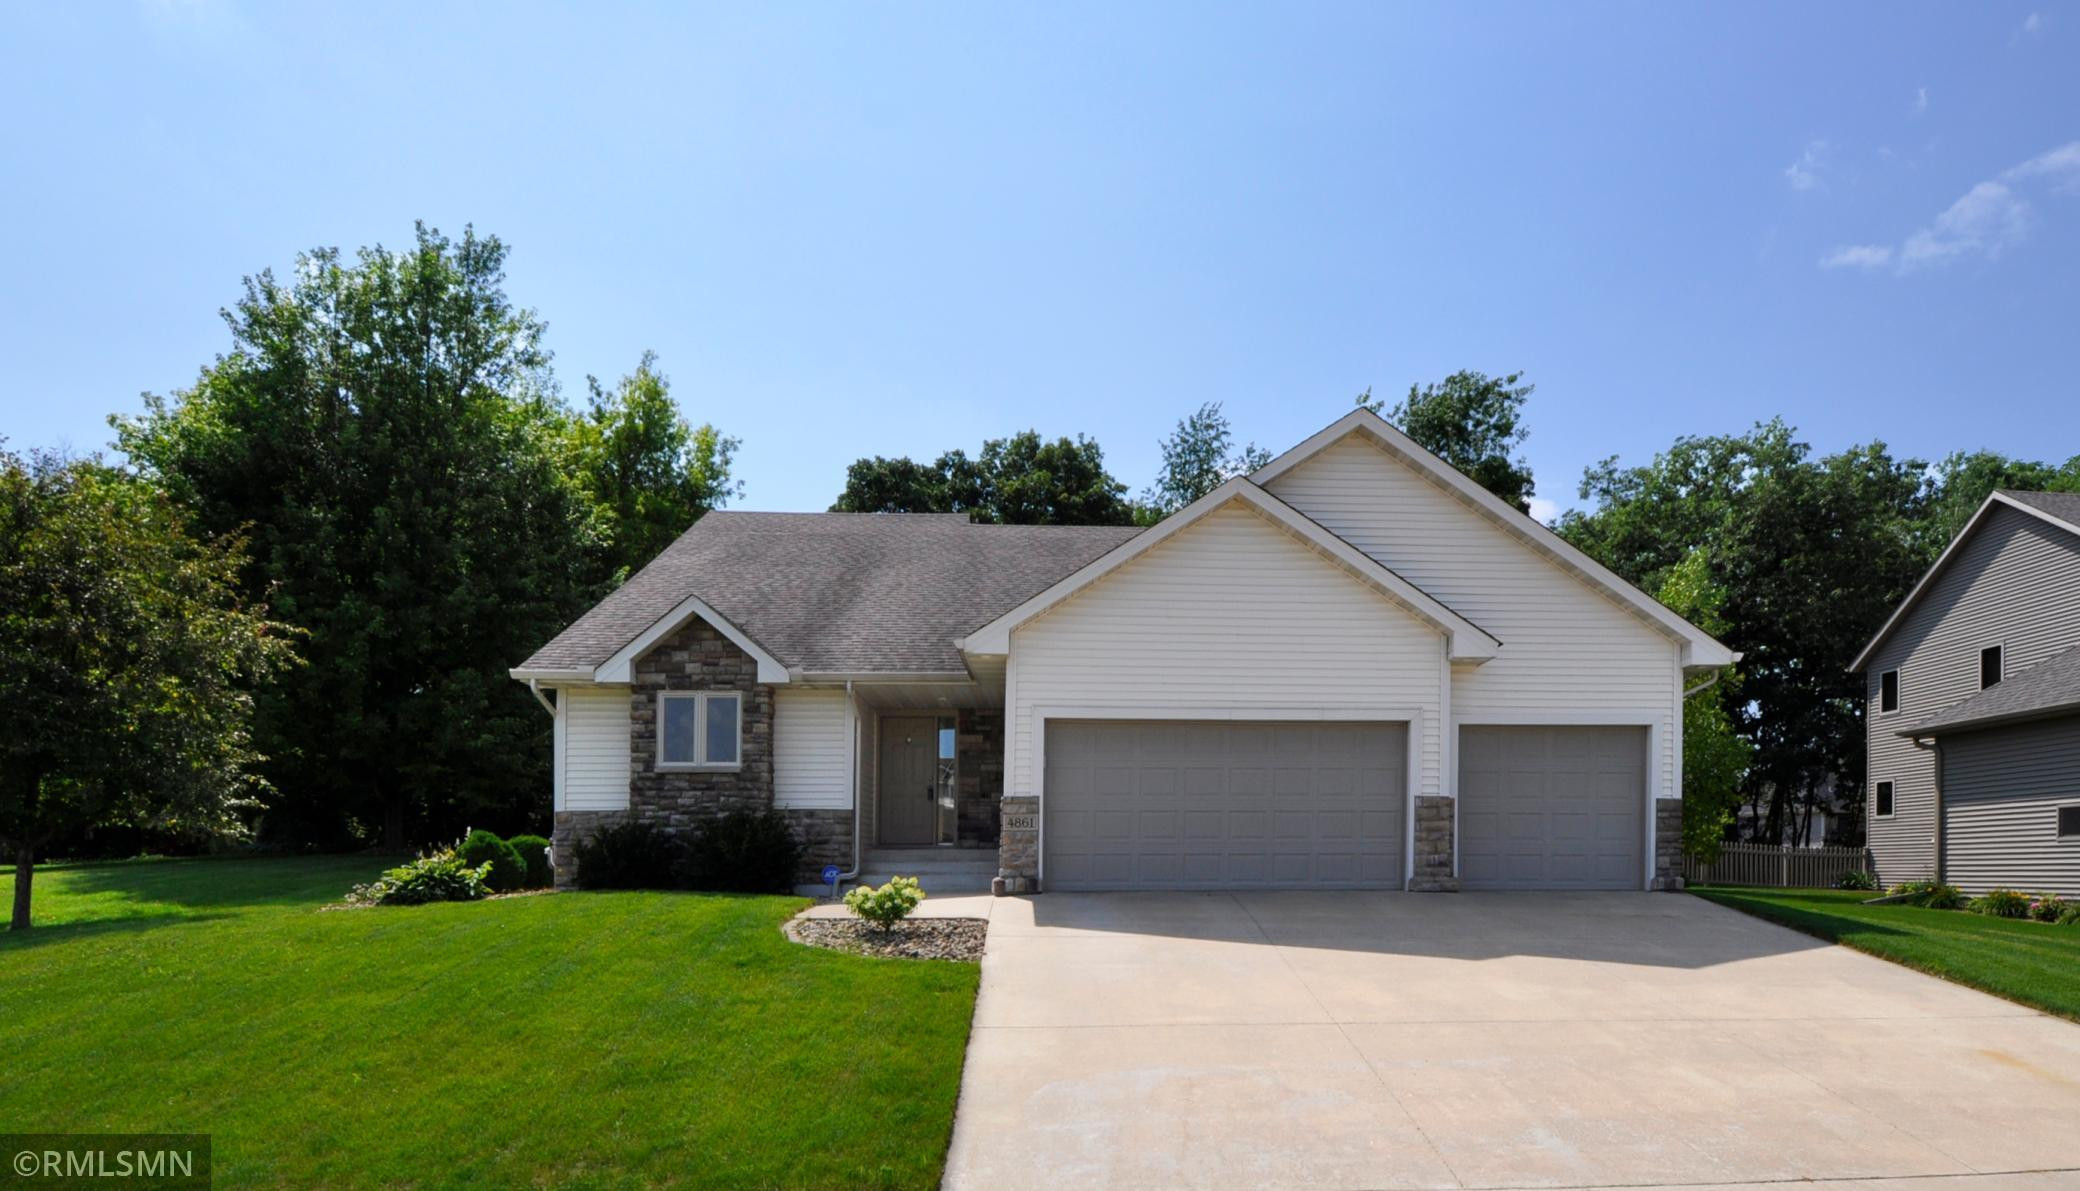 4861 Scenic View Drive SW, Rochester, MN 55902